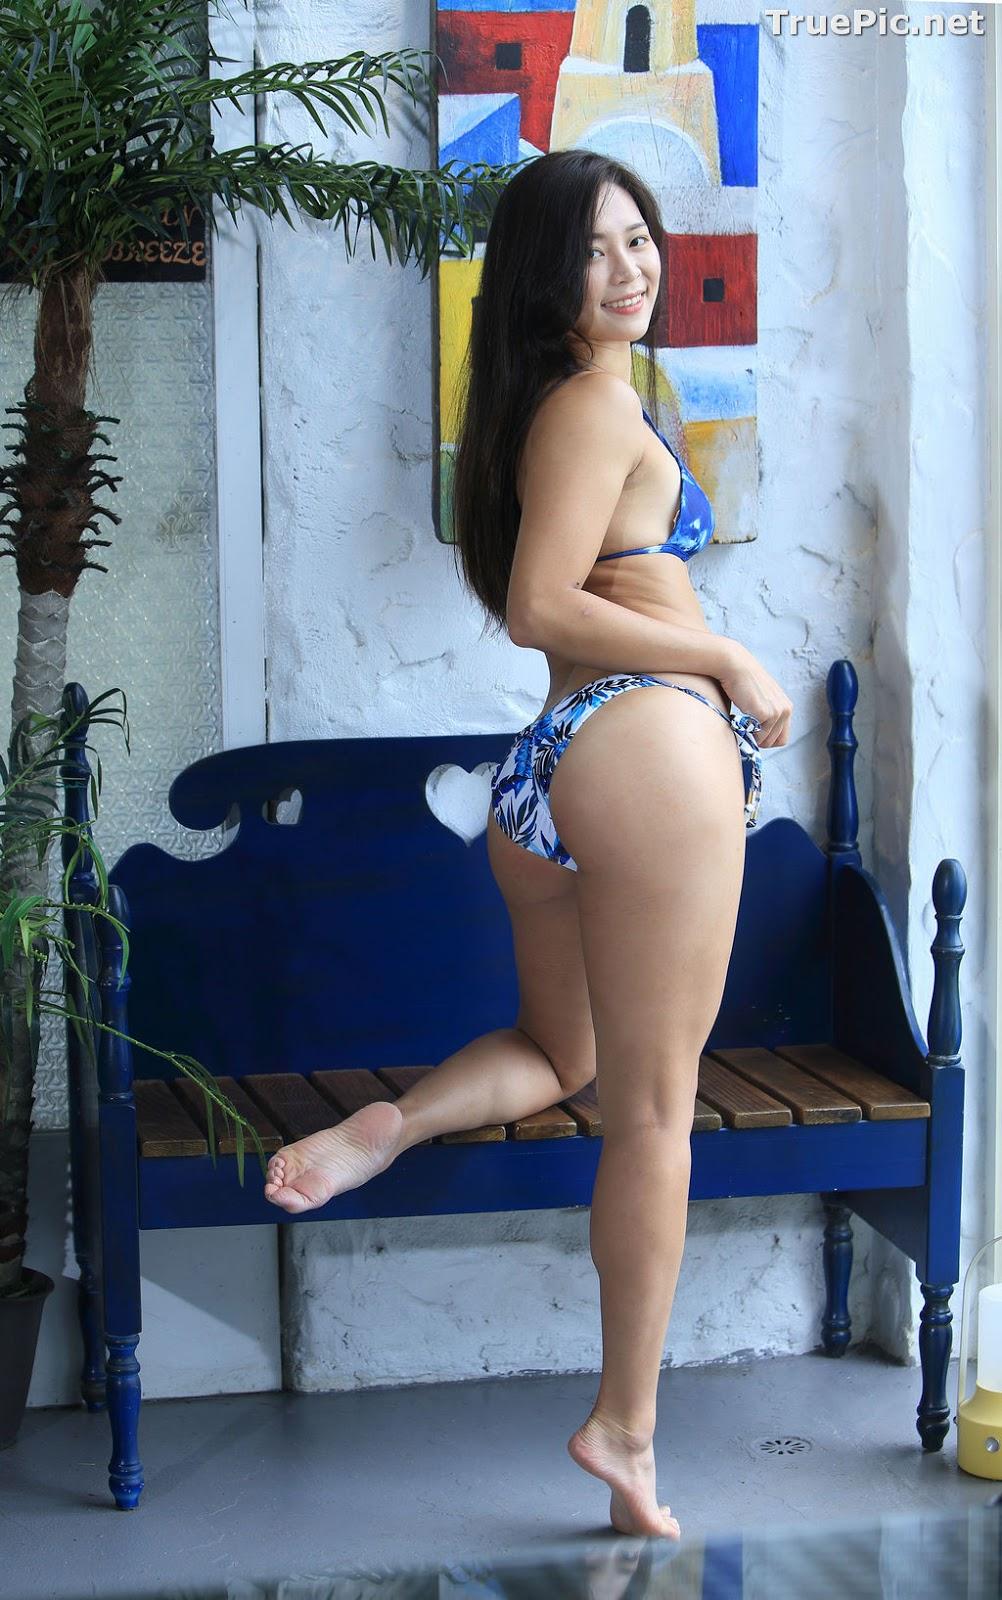 Image Taiwanese Model - Shelly - Beautiful Bodybuilding Bikini Girl - TruePic.net - Picture-30